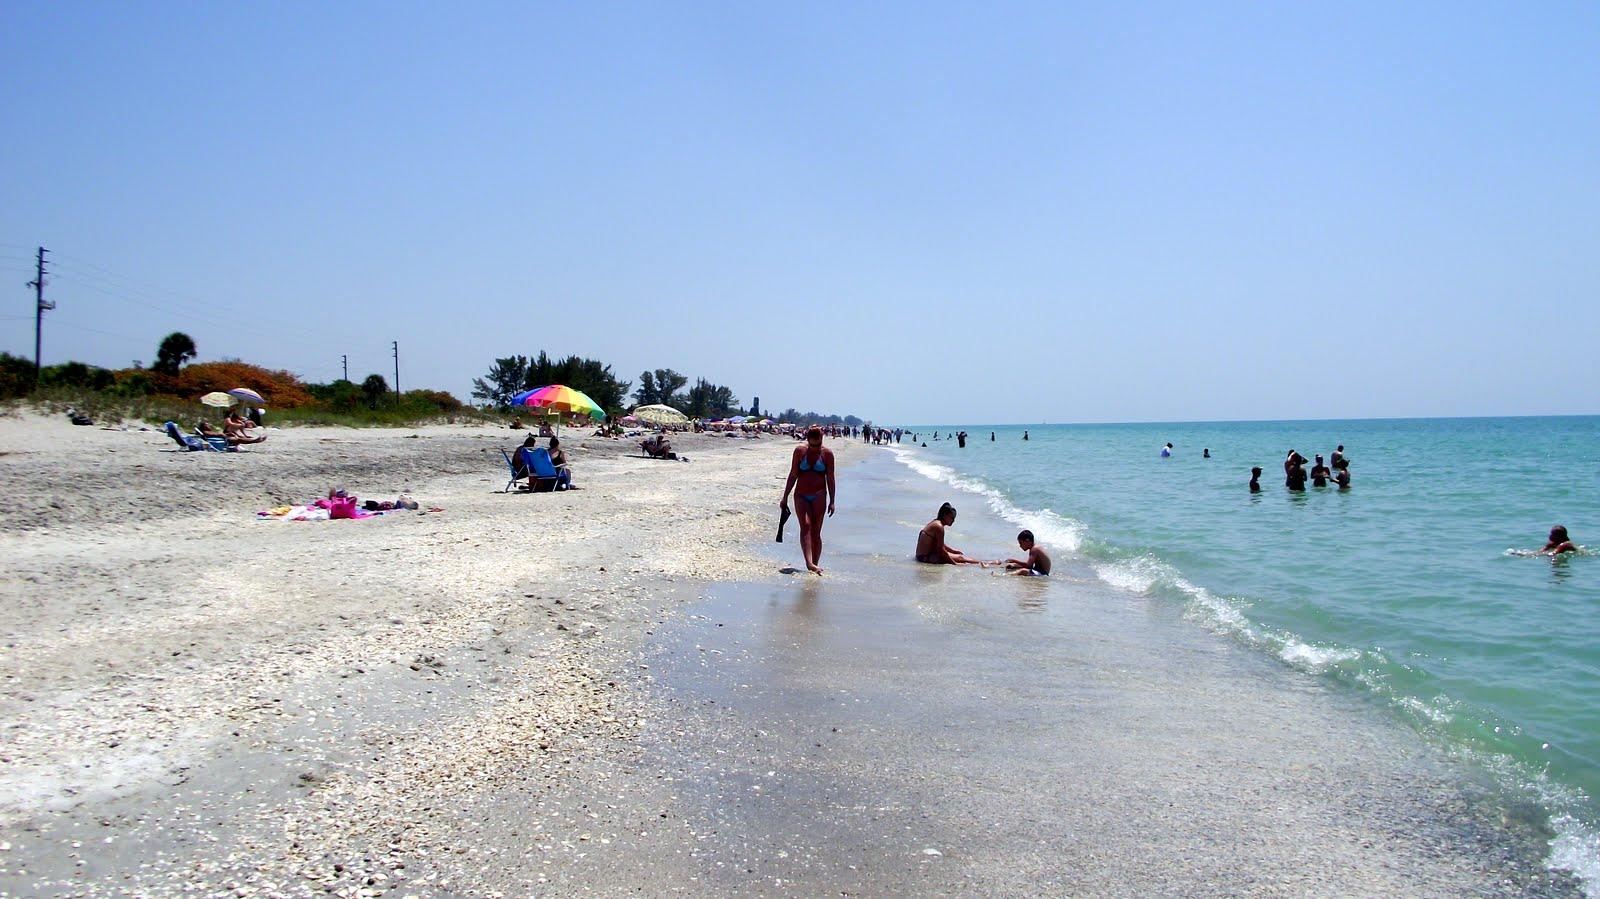 The Essential Beachcomber: Apr 12, 2011